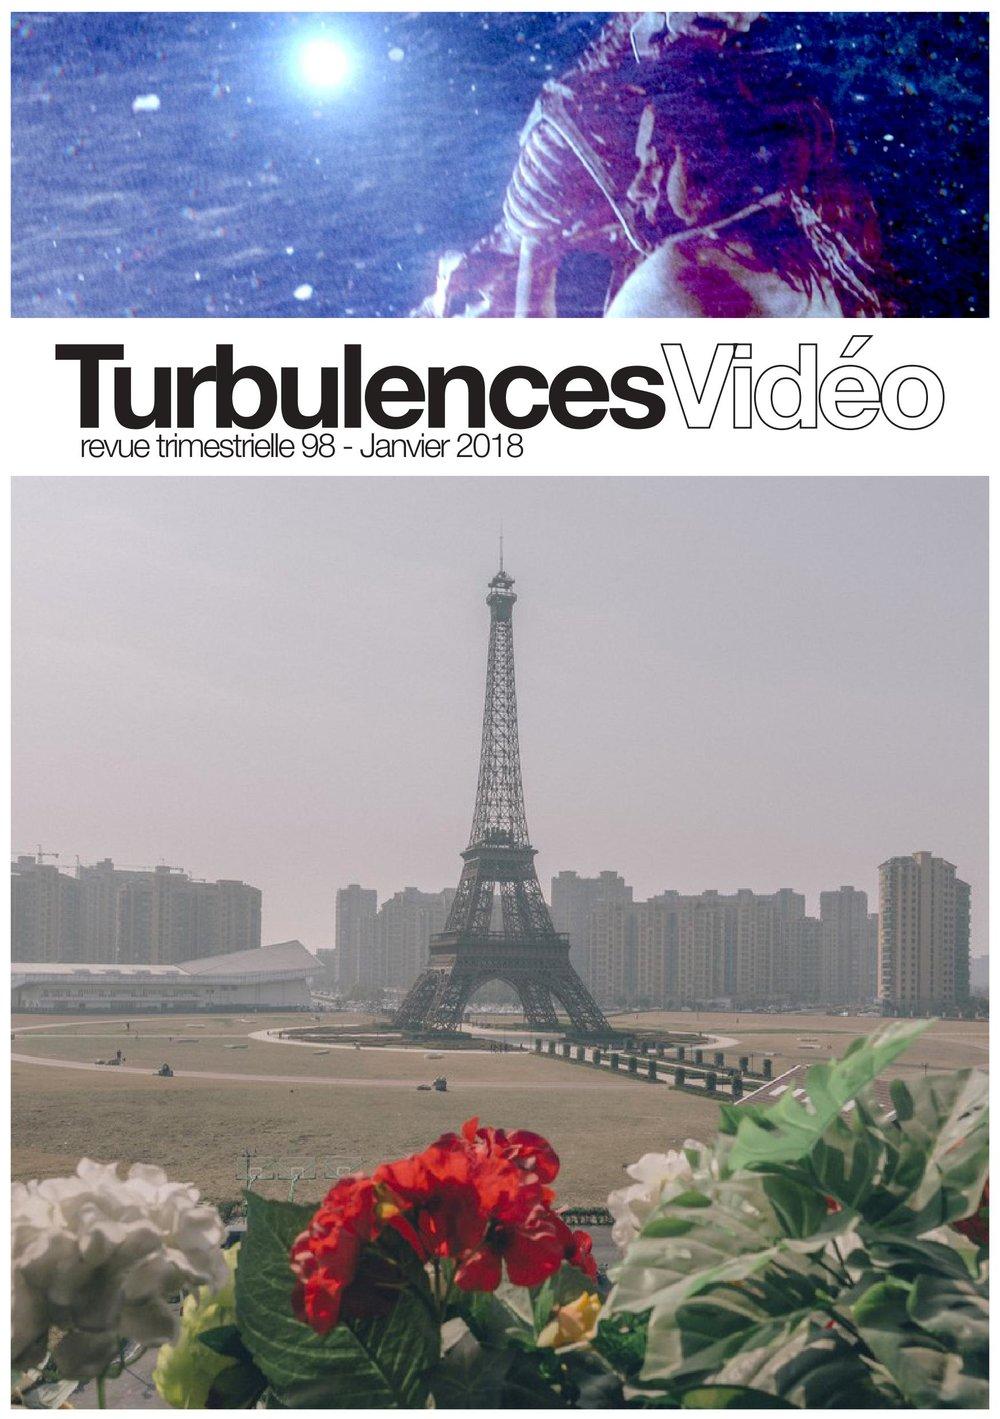 Mohamed Thara - Turbulences Vidéo ≠ 98.jpg